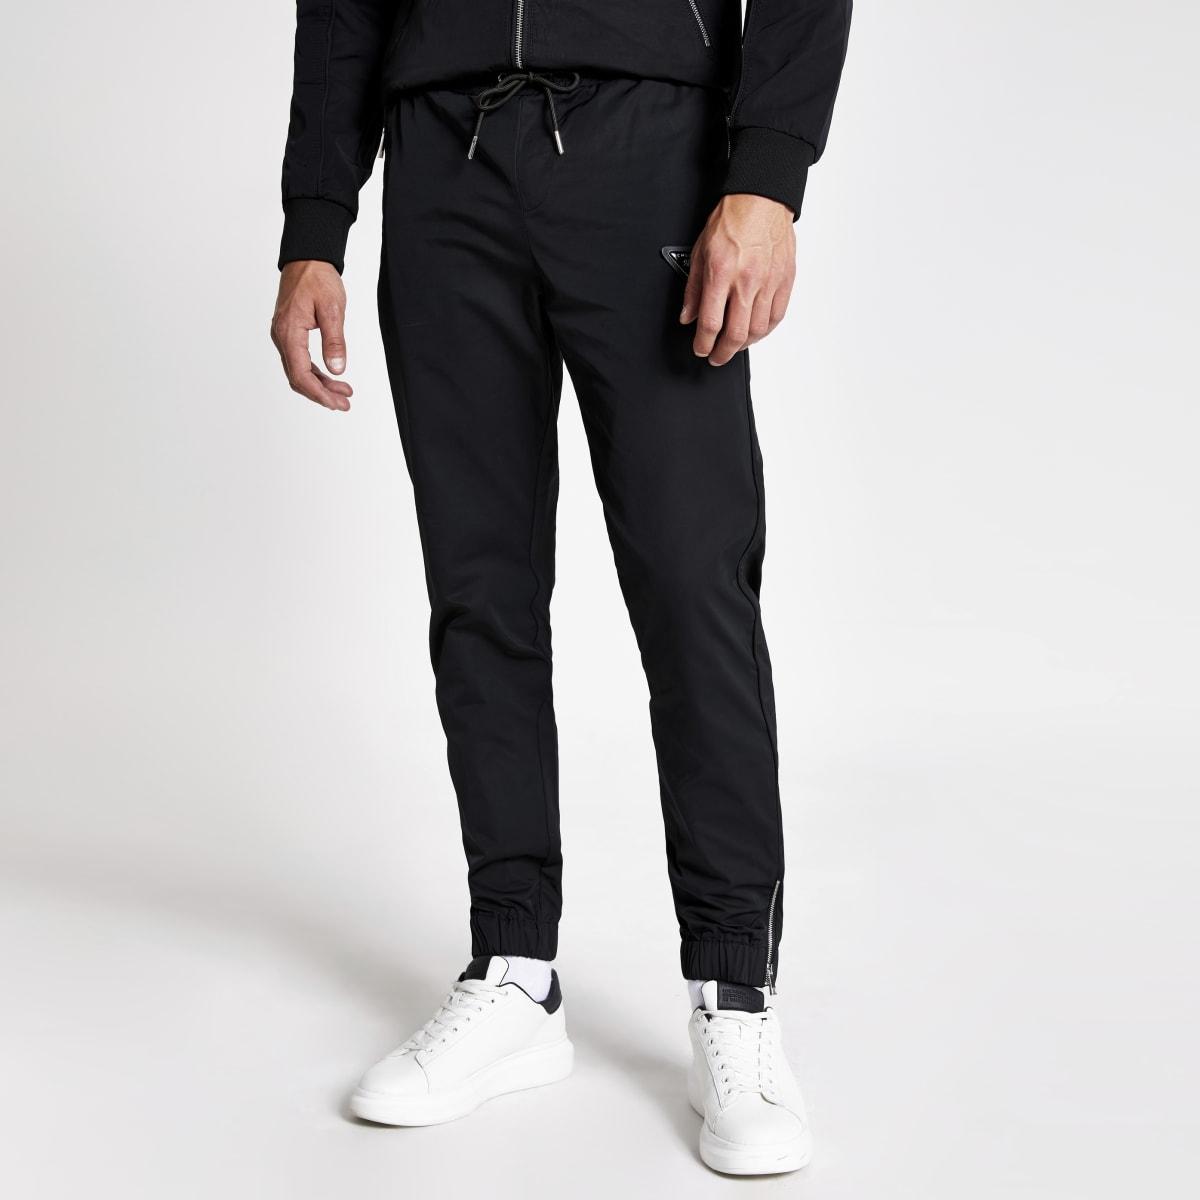 Black MCMLX nylon joggers